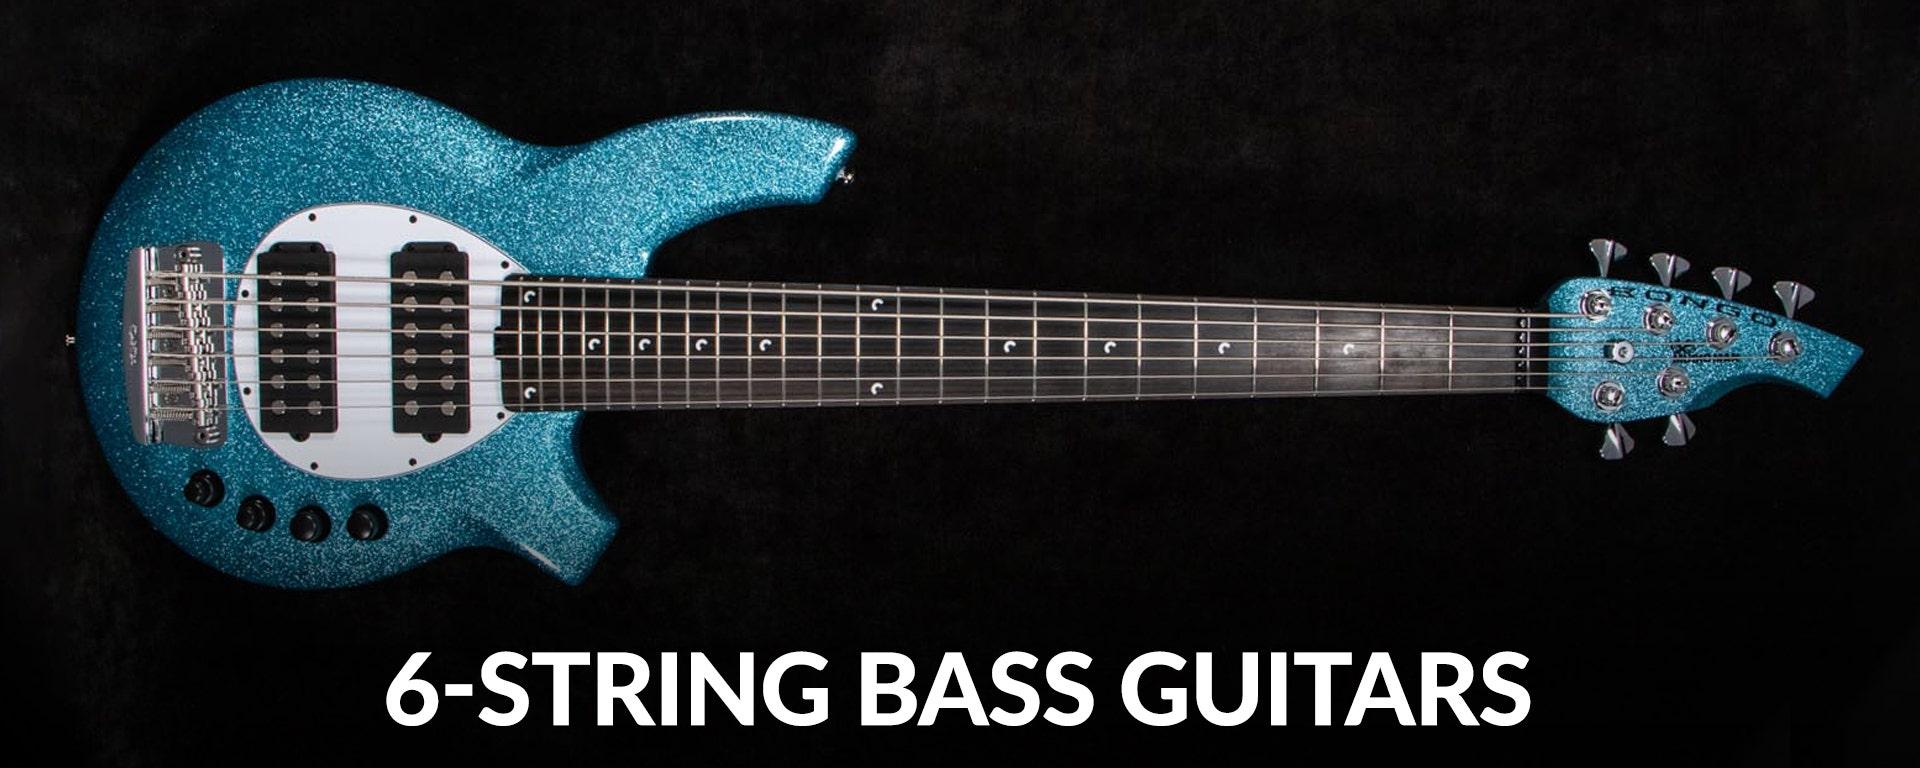 Shop 6-string electric bass guitars at Sam Ash